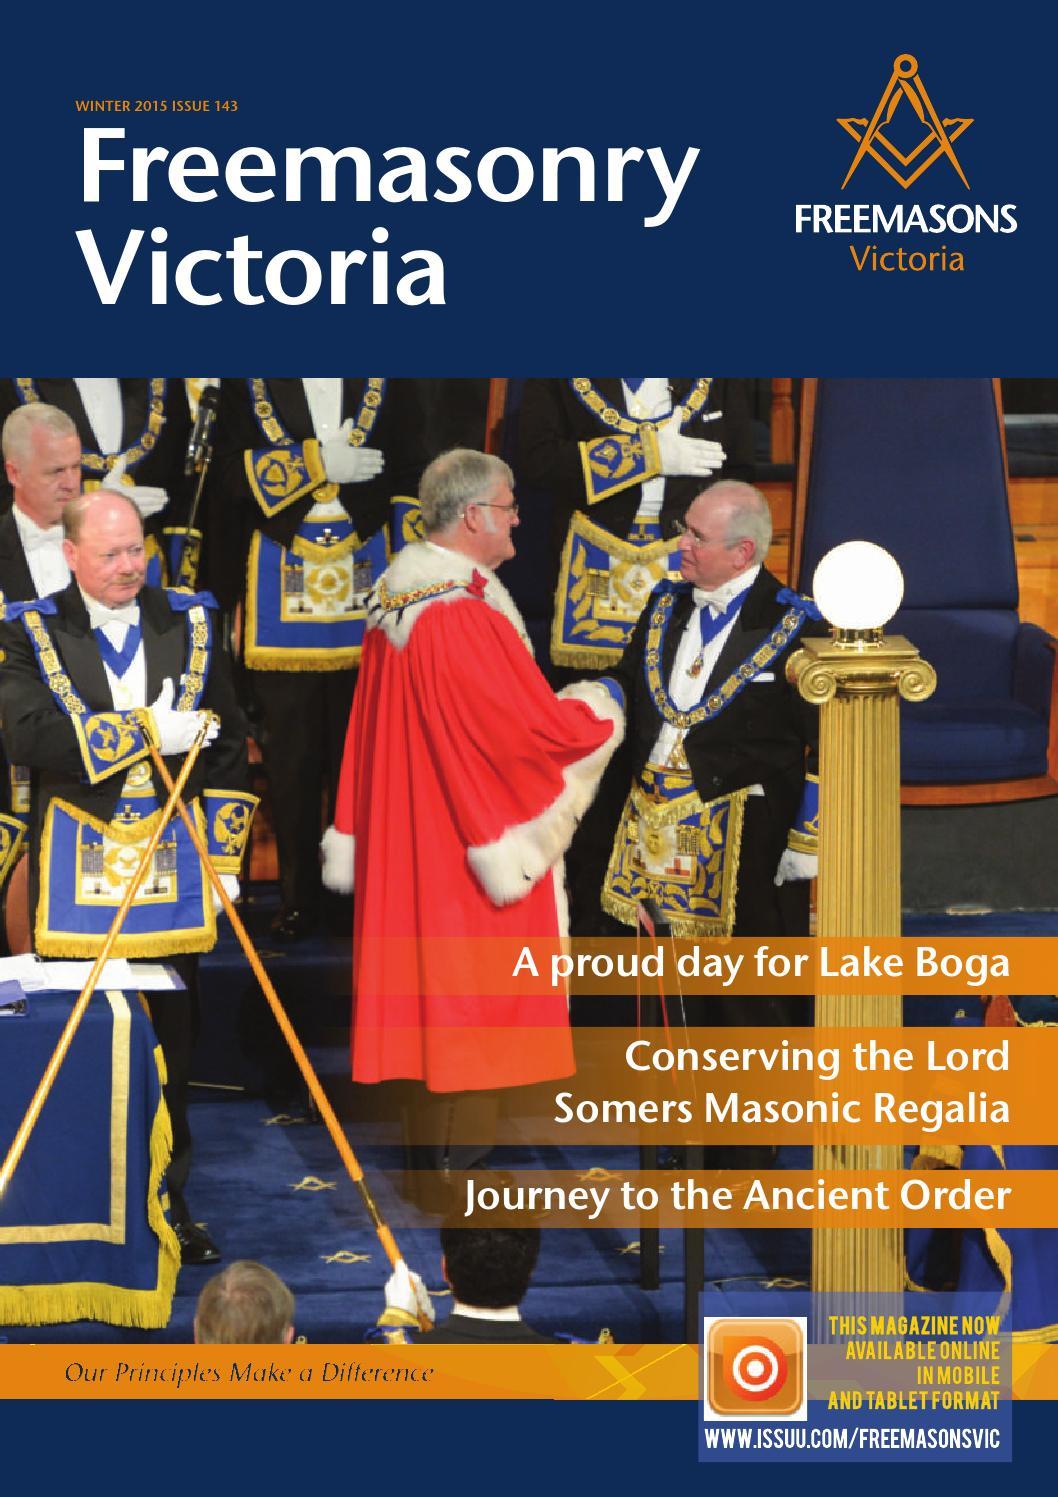 Freemasonry Victoria Magazine 143 By Freemasons Victoria Issuu